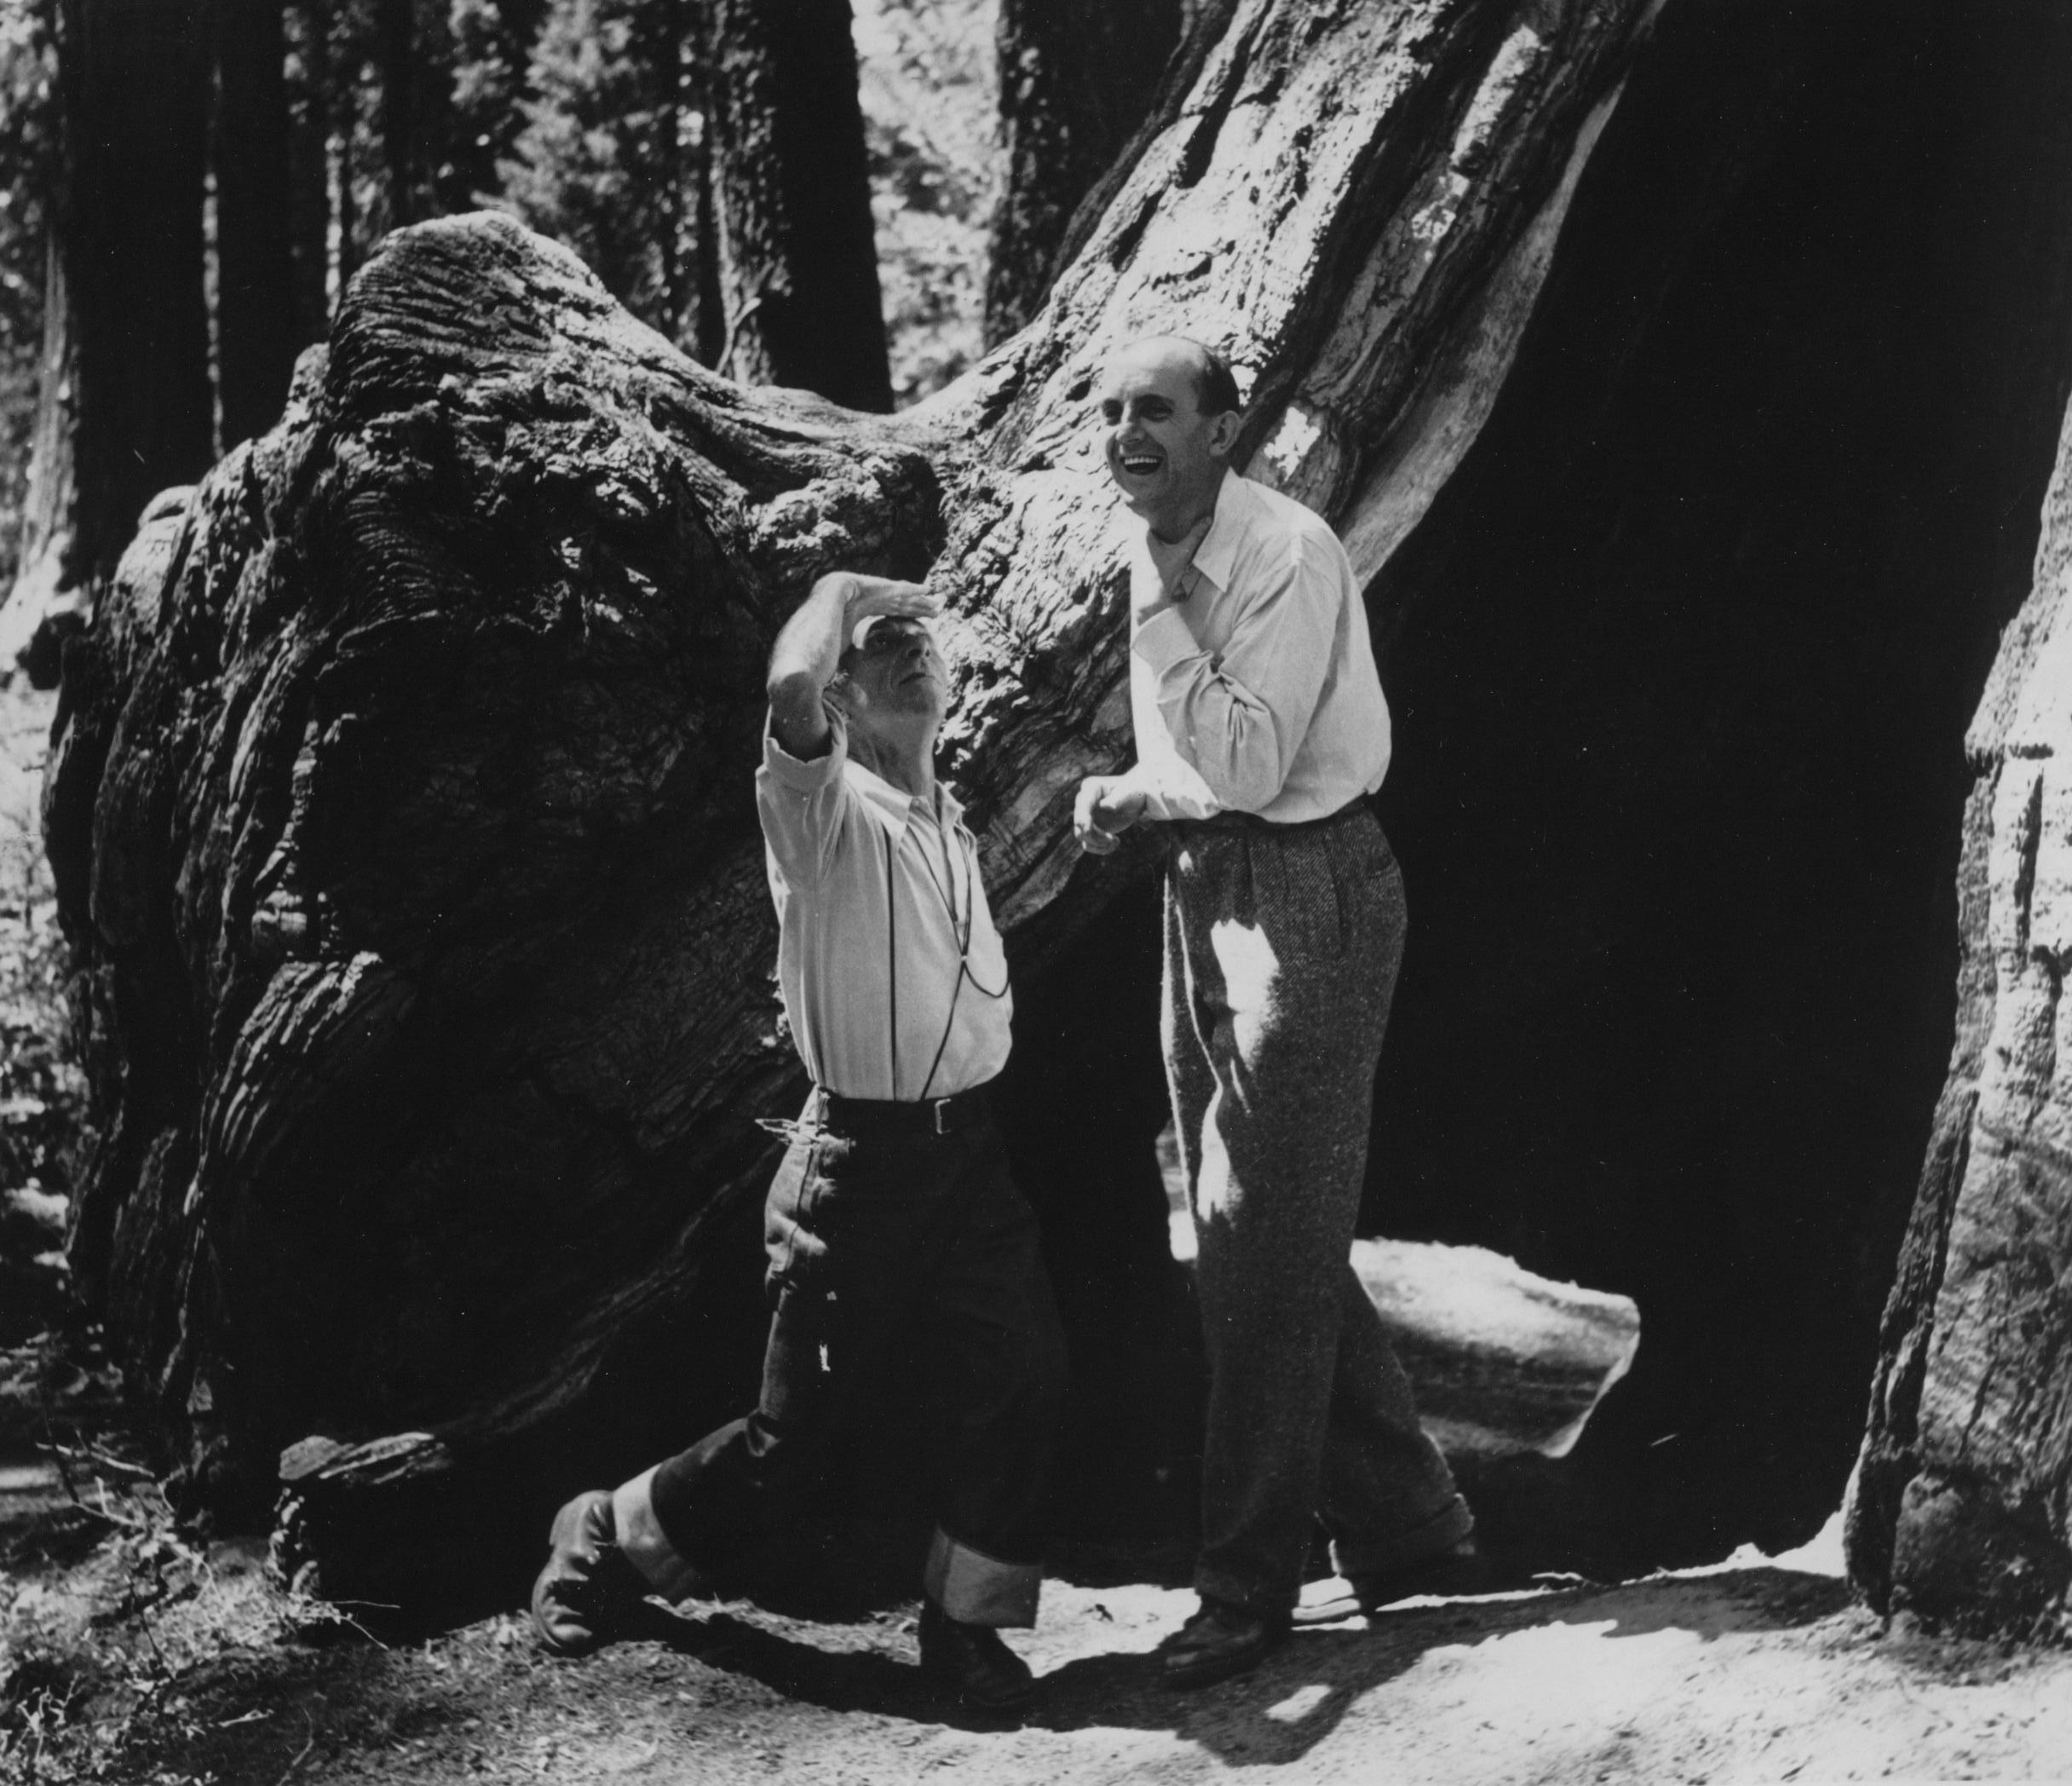 Ansel Adams and Edward Weston in Yosemite